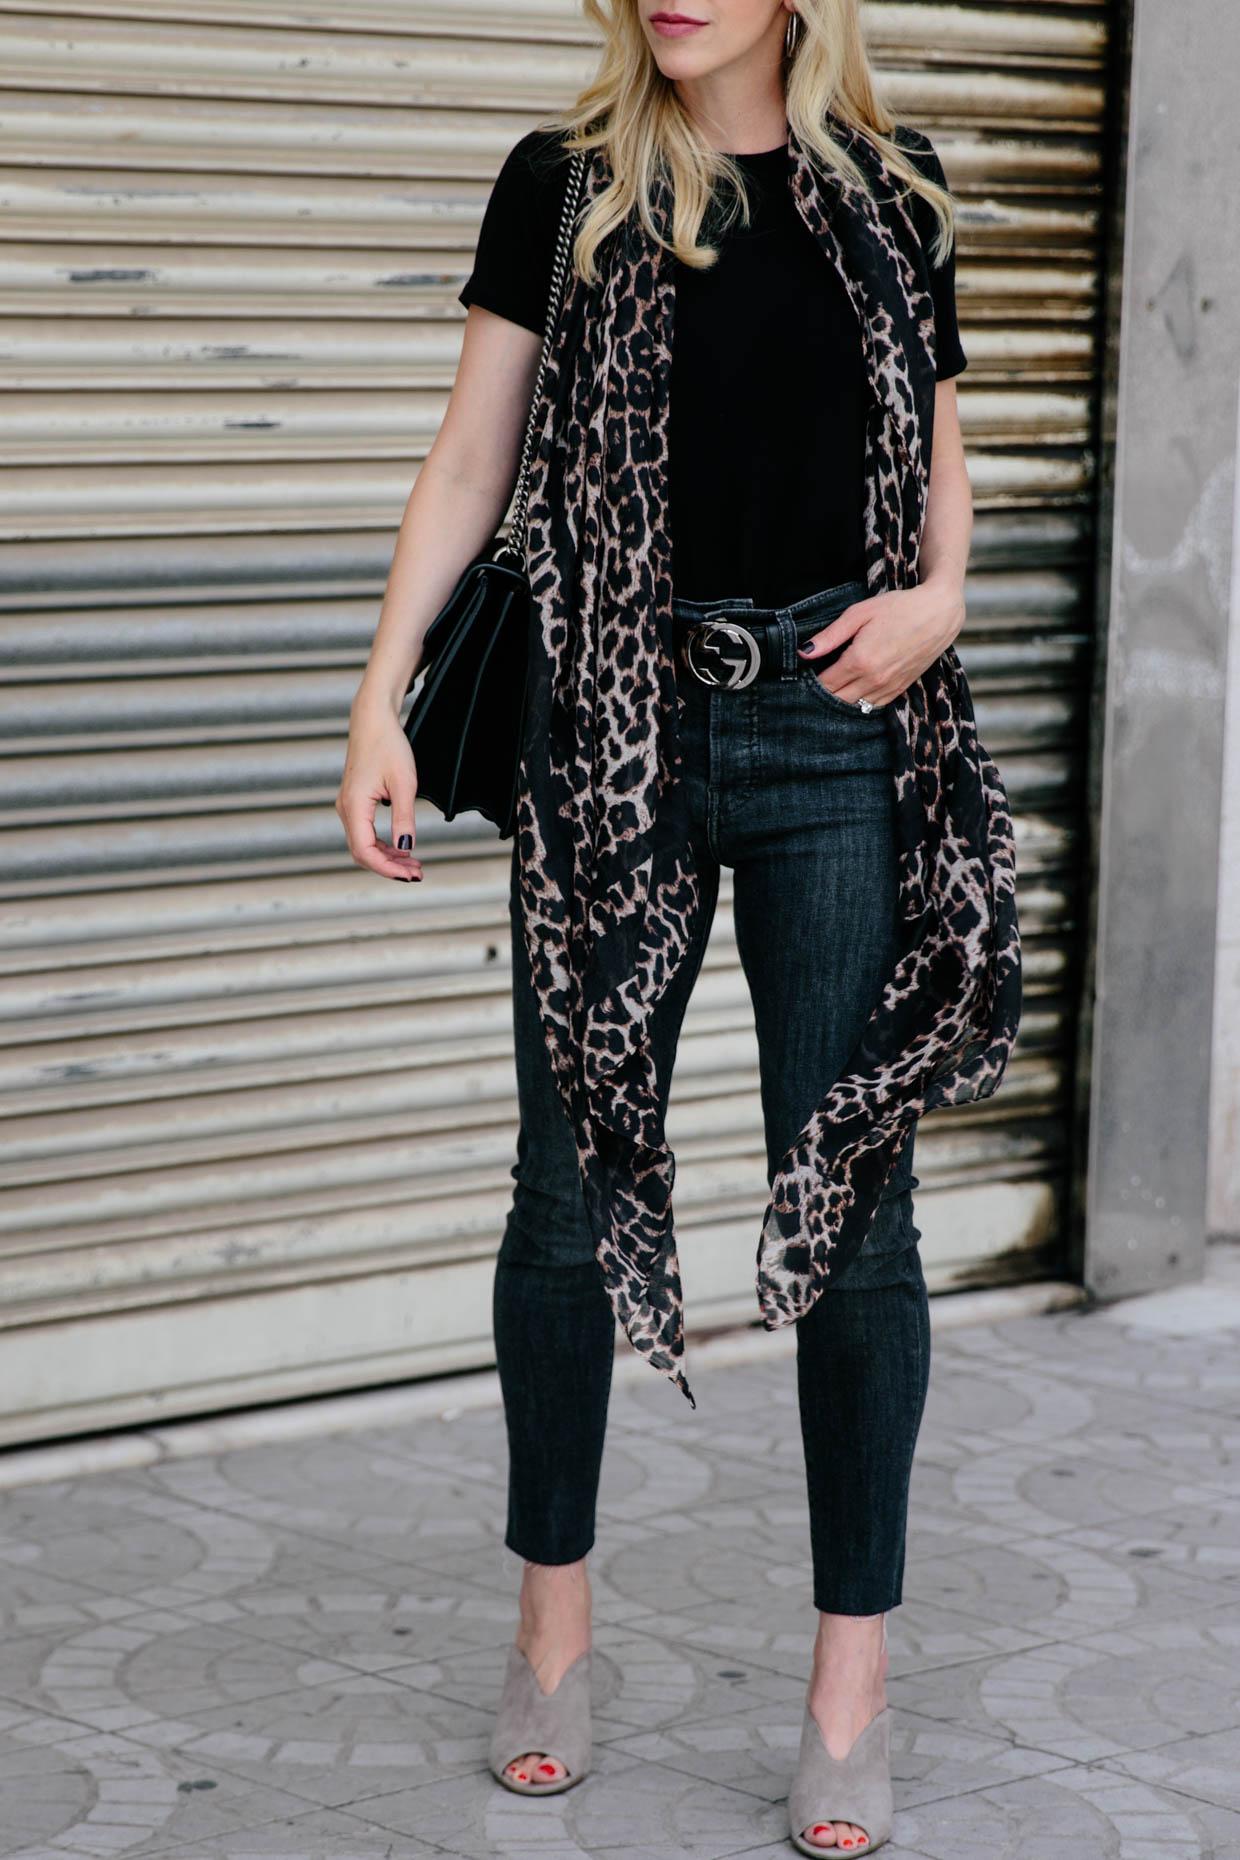 351dee79675 Meagan Brandon fashion blogger of Meagan s Moda wears leopard print scarf  with black bodysuit